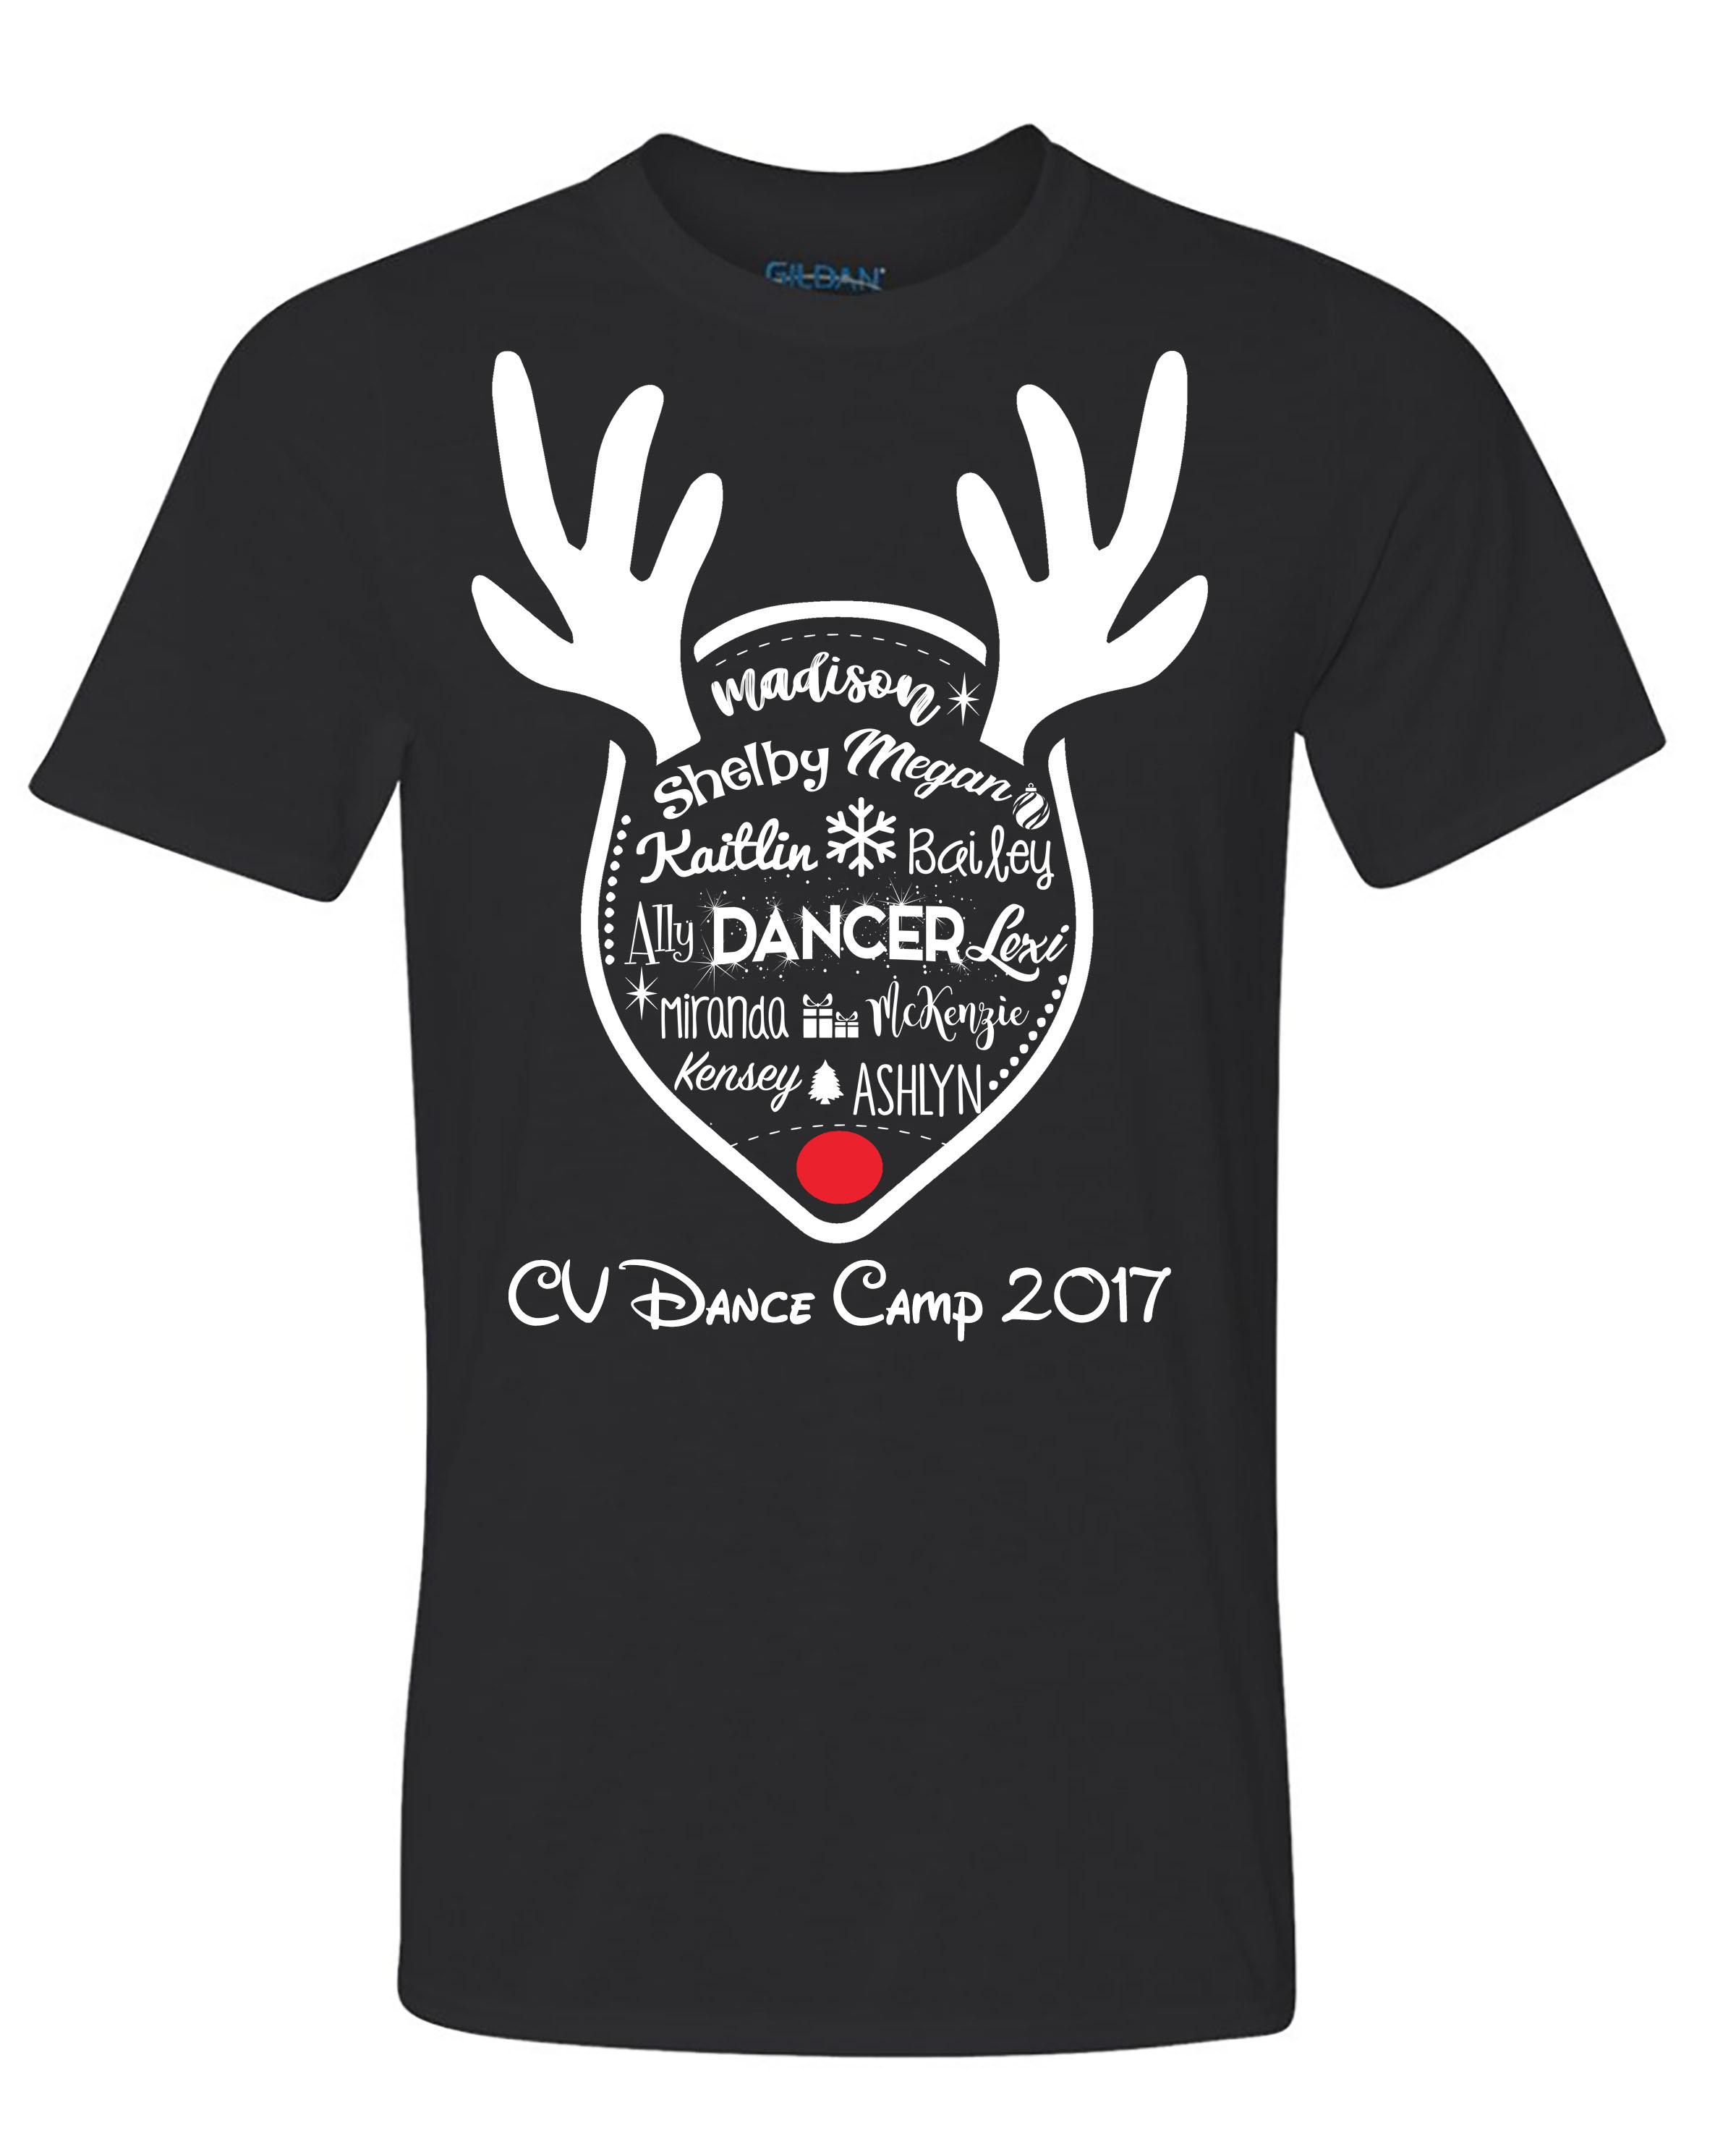 CV Dance Camp 2017